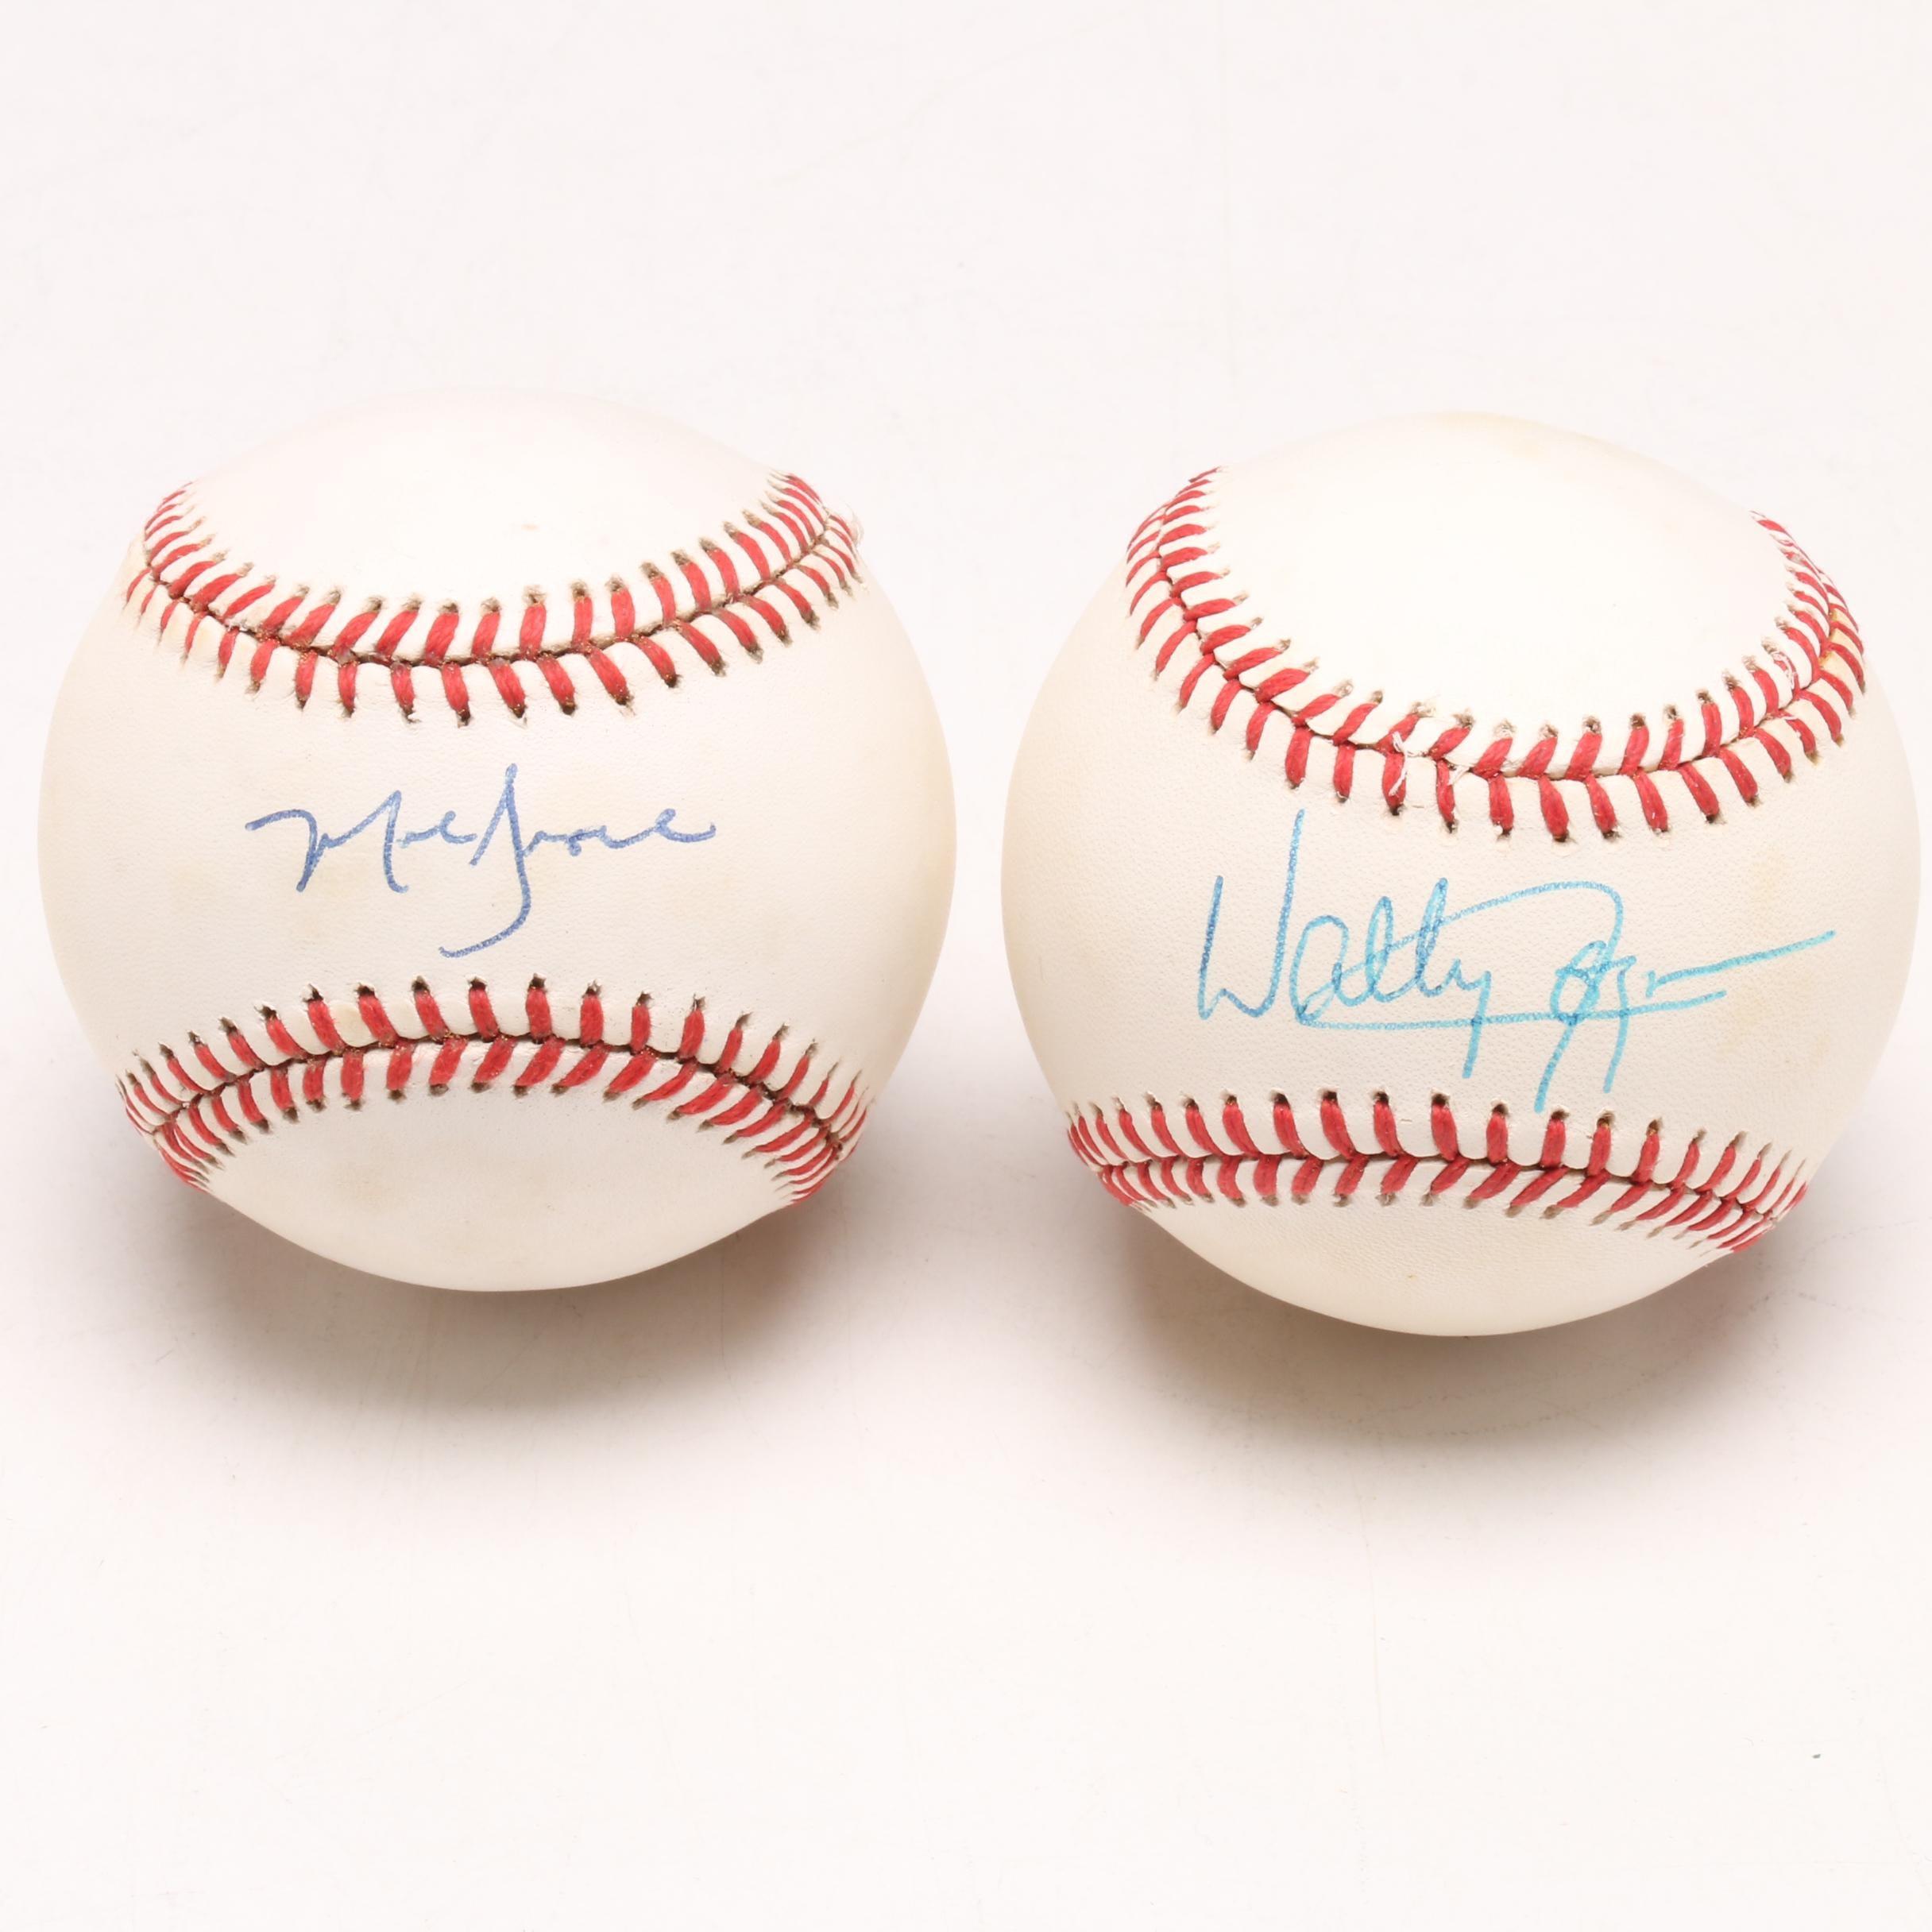 Wally Joyner and Mark Grace Signed Rawlings Baseballs